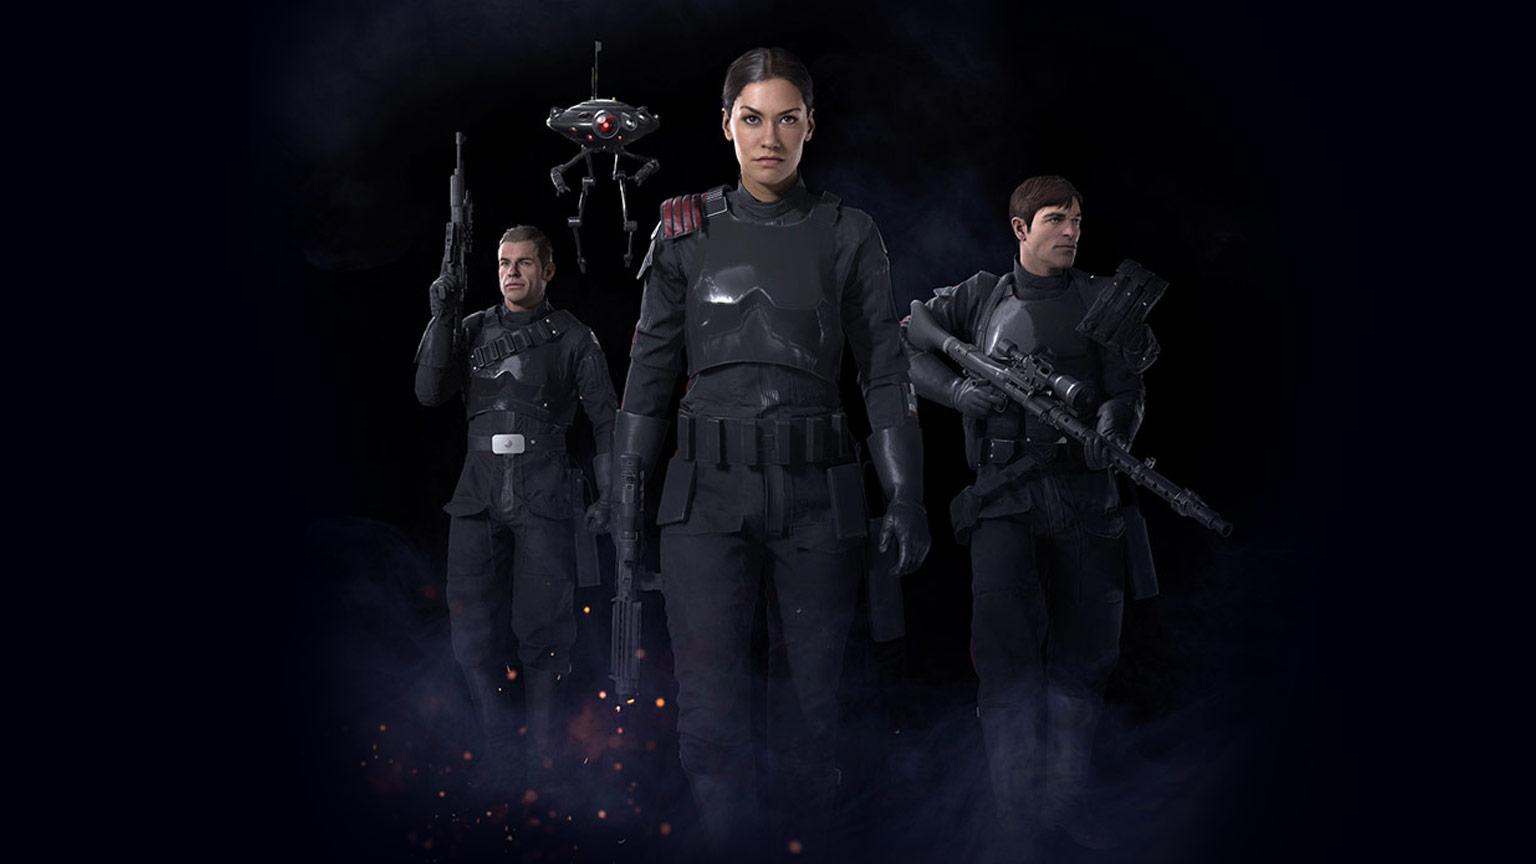 inferno squad battlefront II star wars